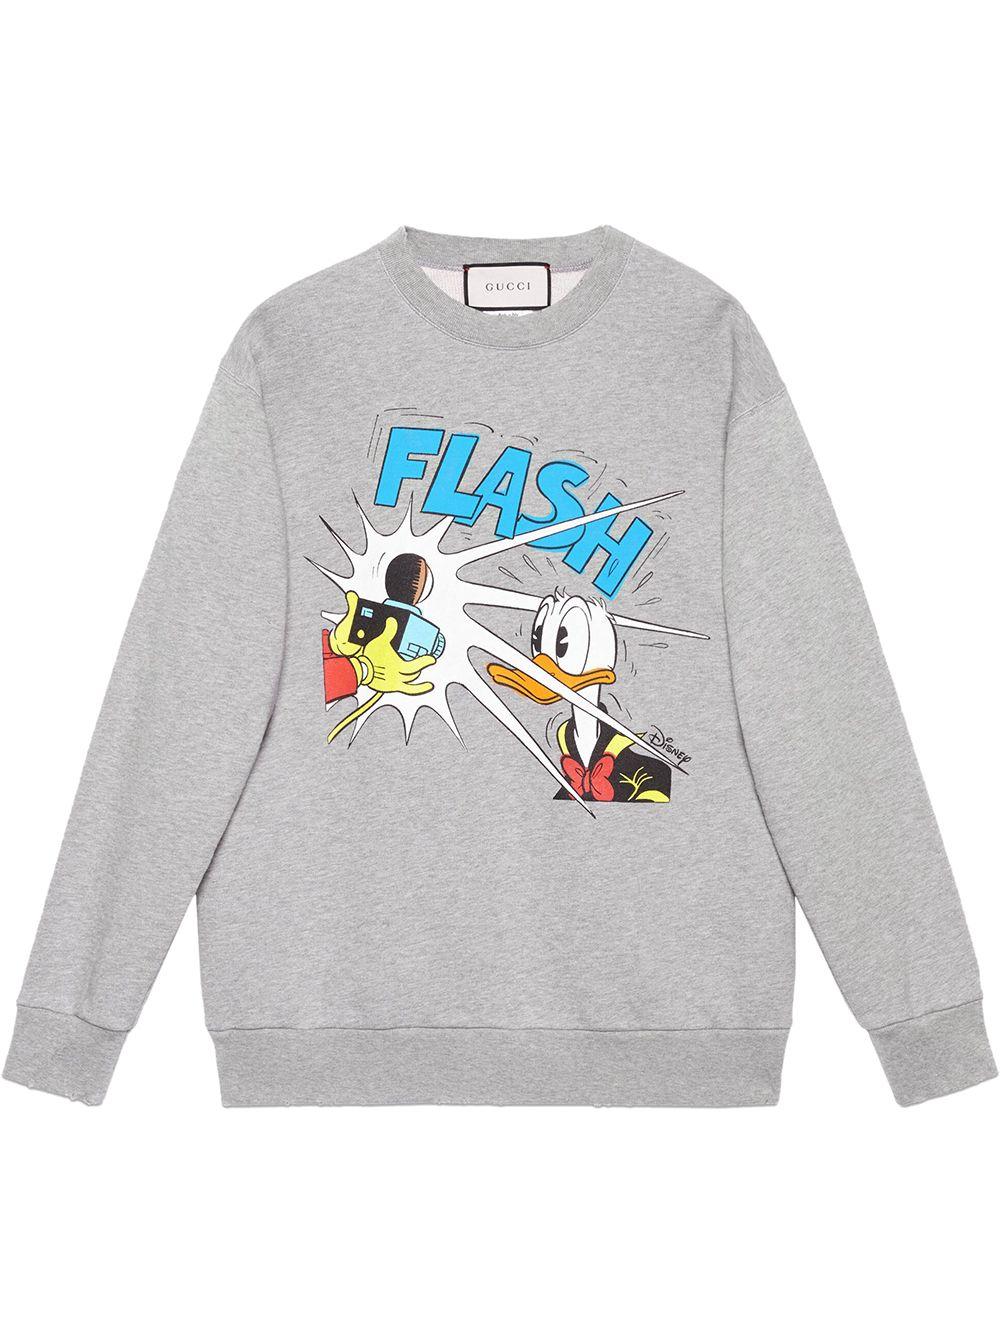 Gucci x Disney 'Donald Duck' Sweatshirt - Grau